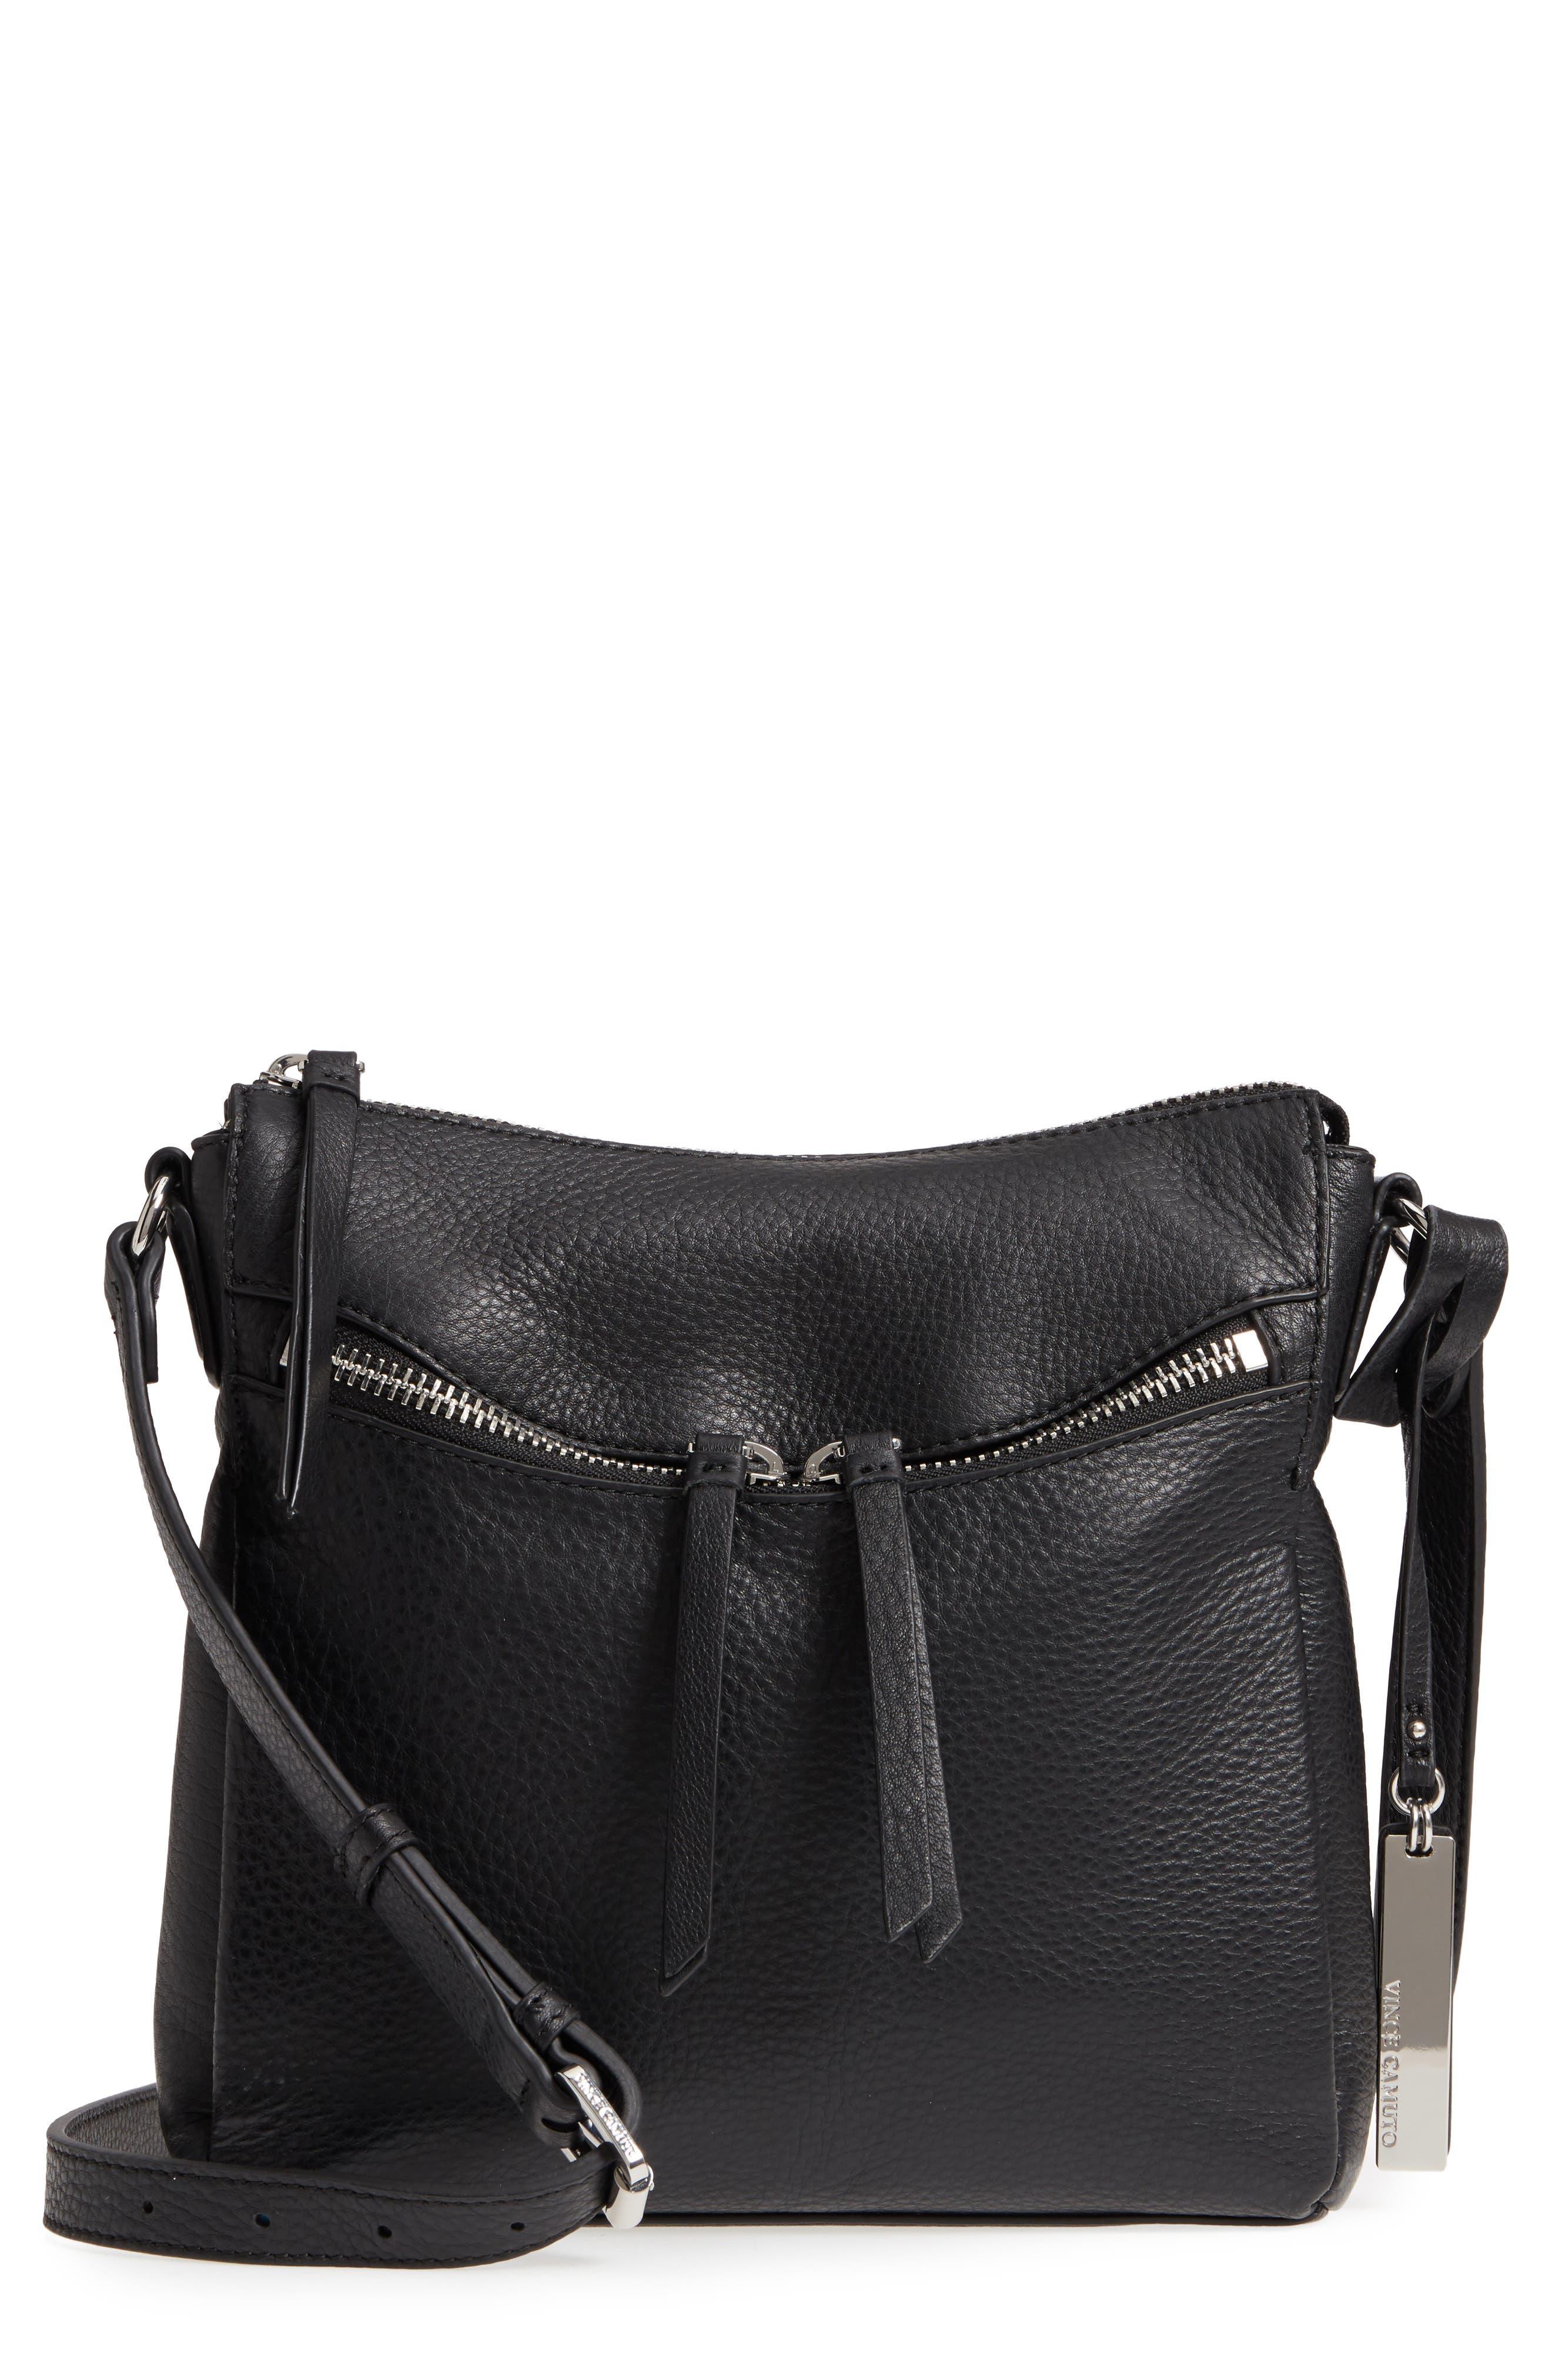 Staja Leather Crossbody Bag,                         Main,                         color, Nero